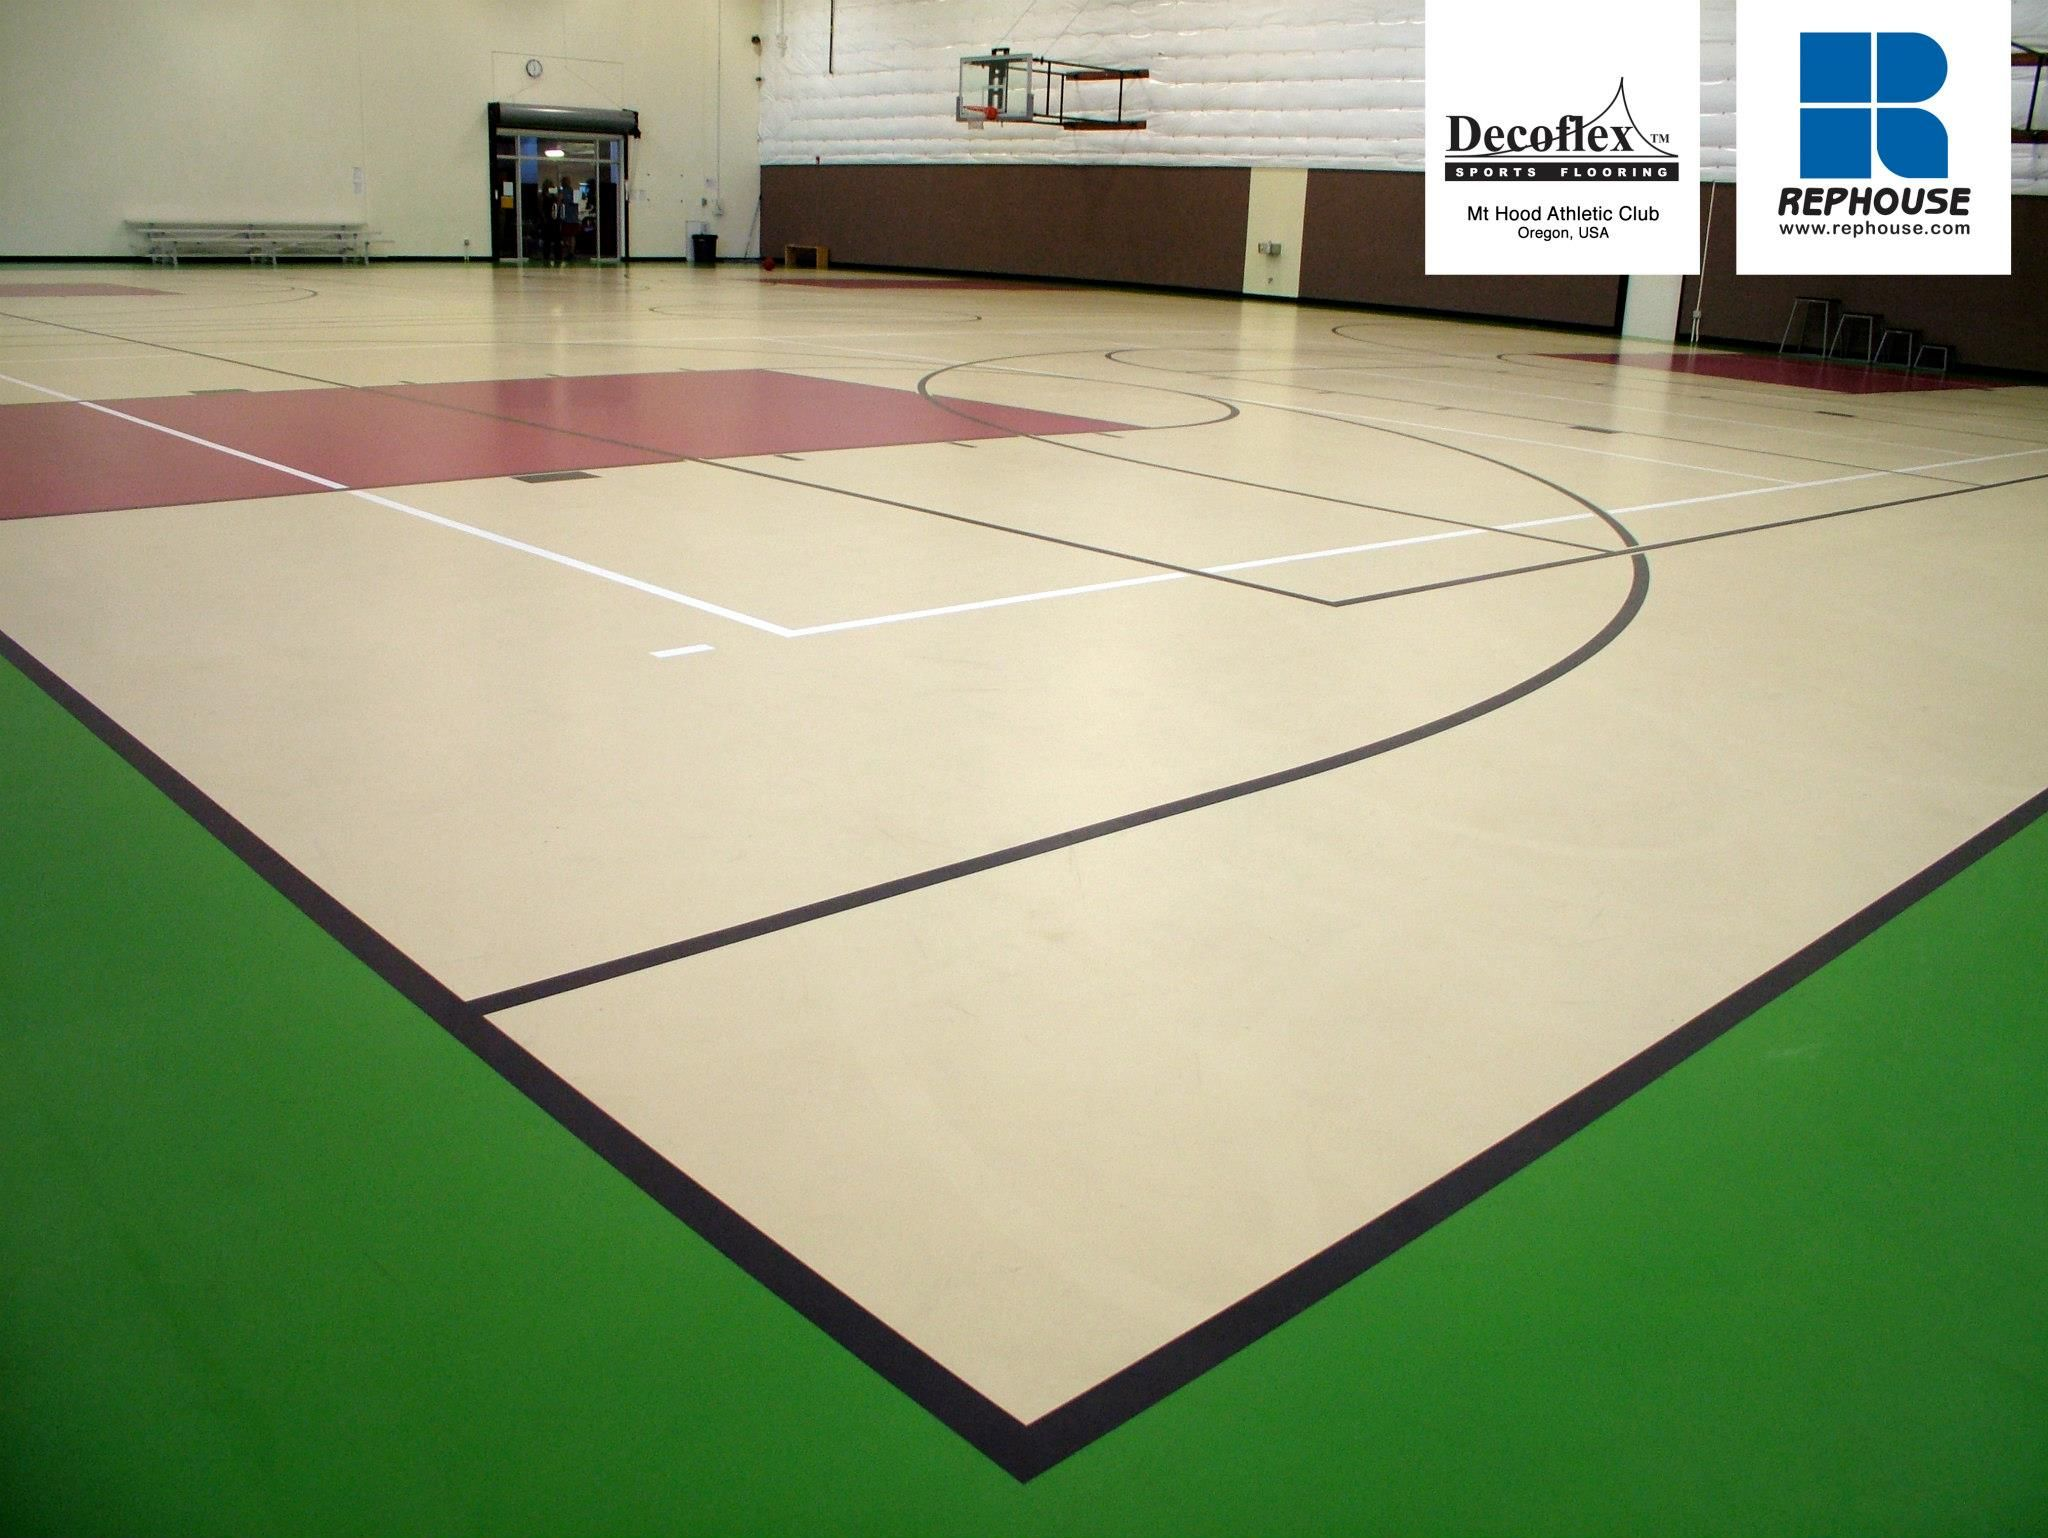 Decoflex Universal Seamless Polyurethane Indoor Sports Flooring Mt Hood Athletic Club Oregon Usa Indoor Sports Indoor Sports